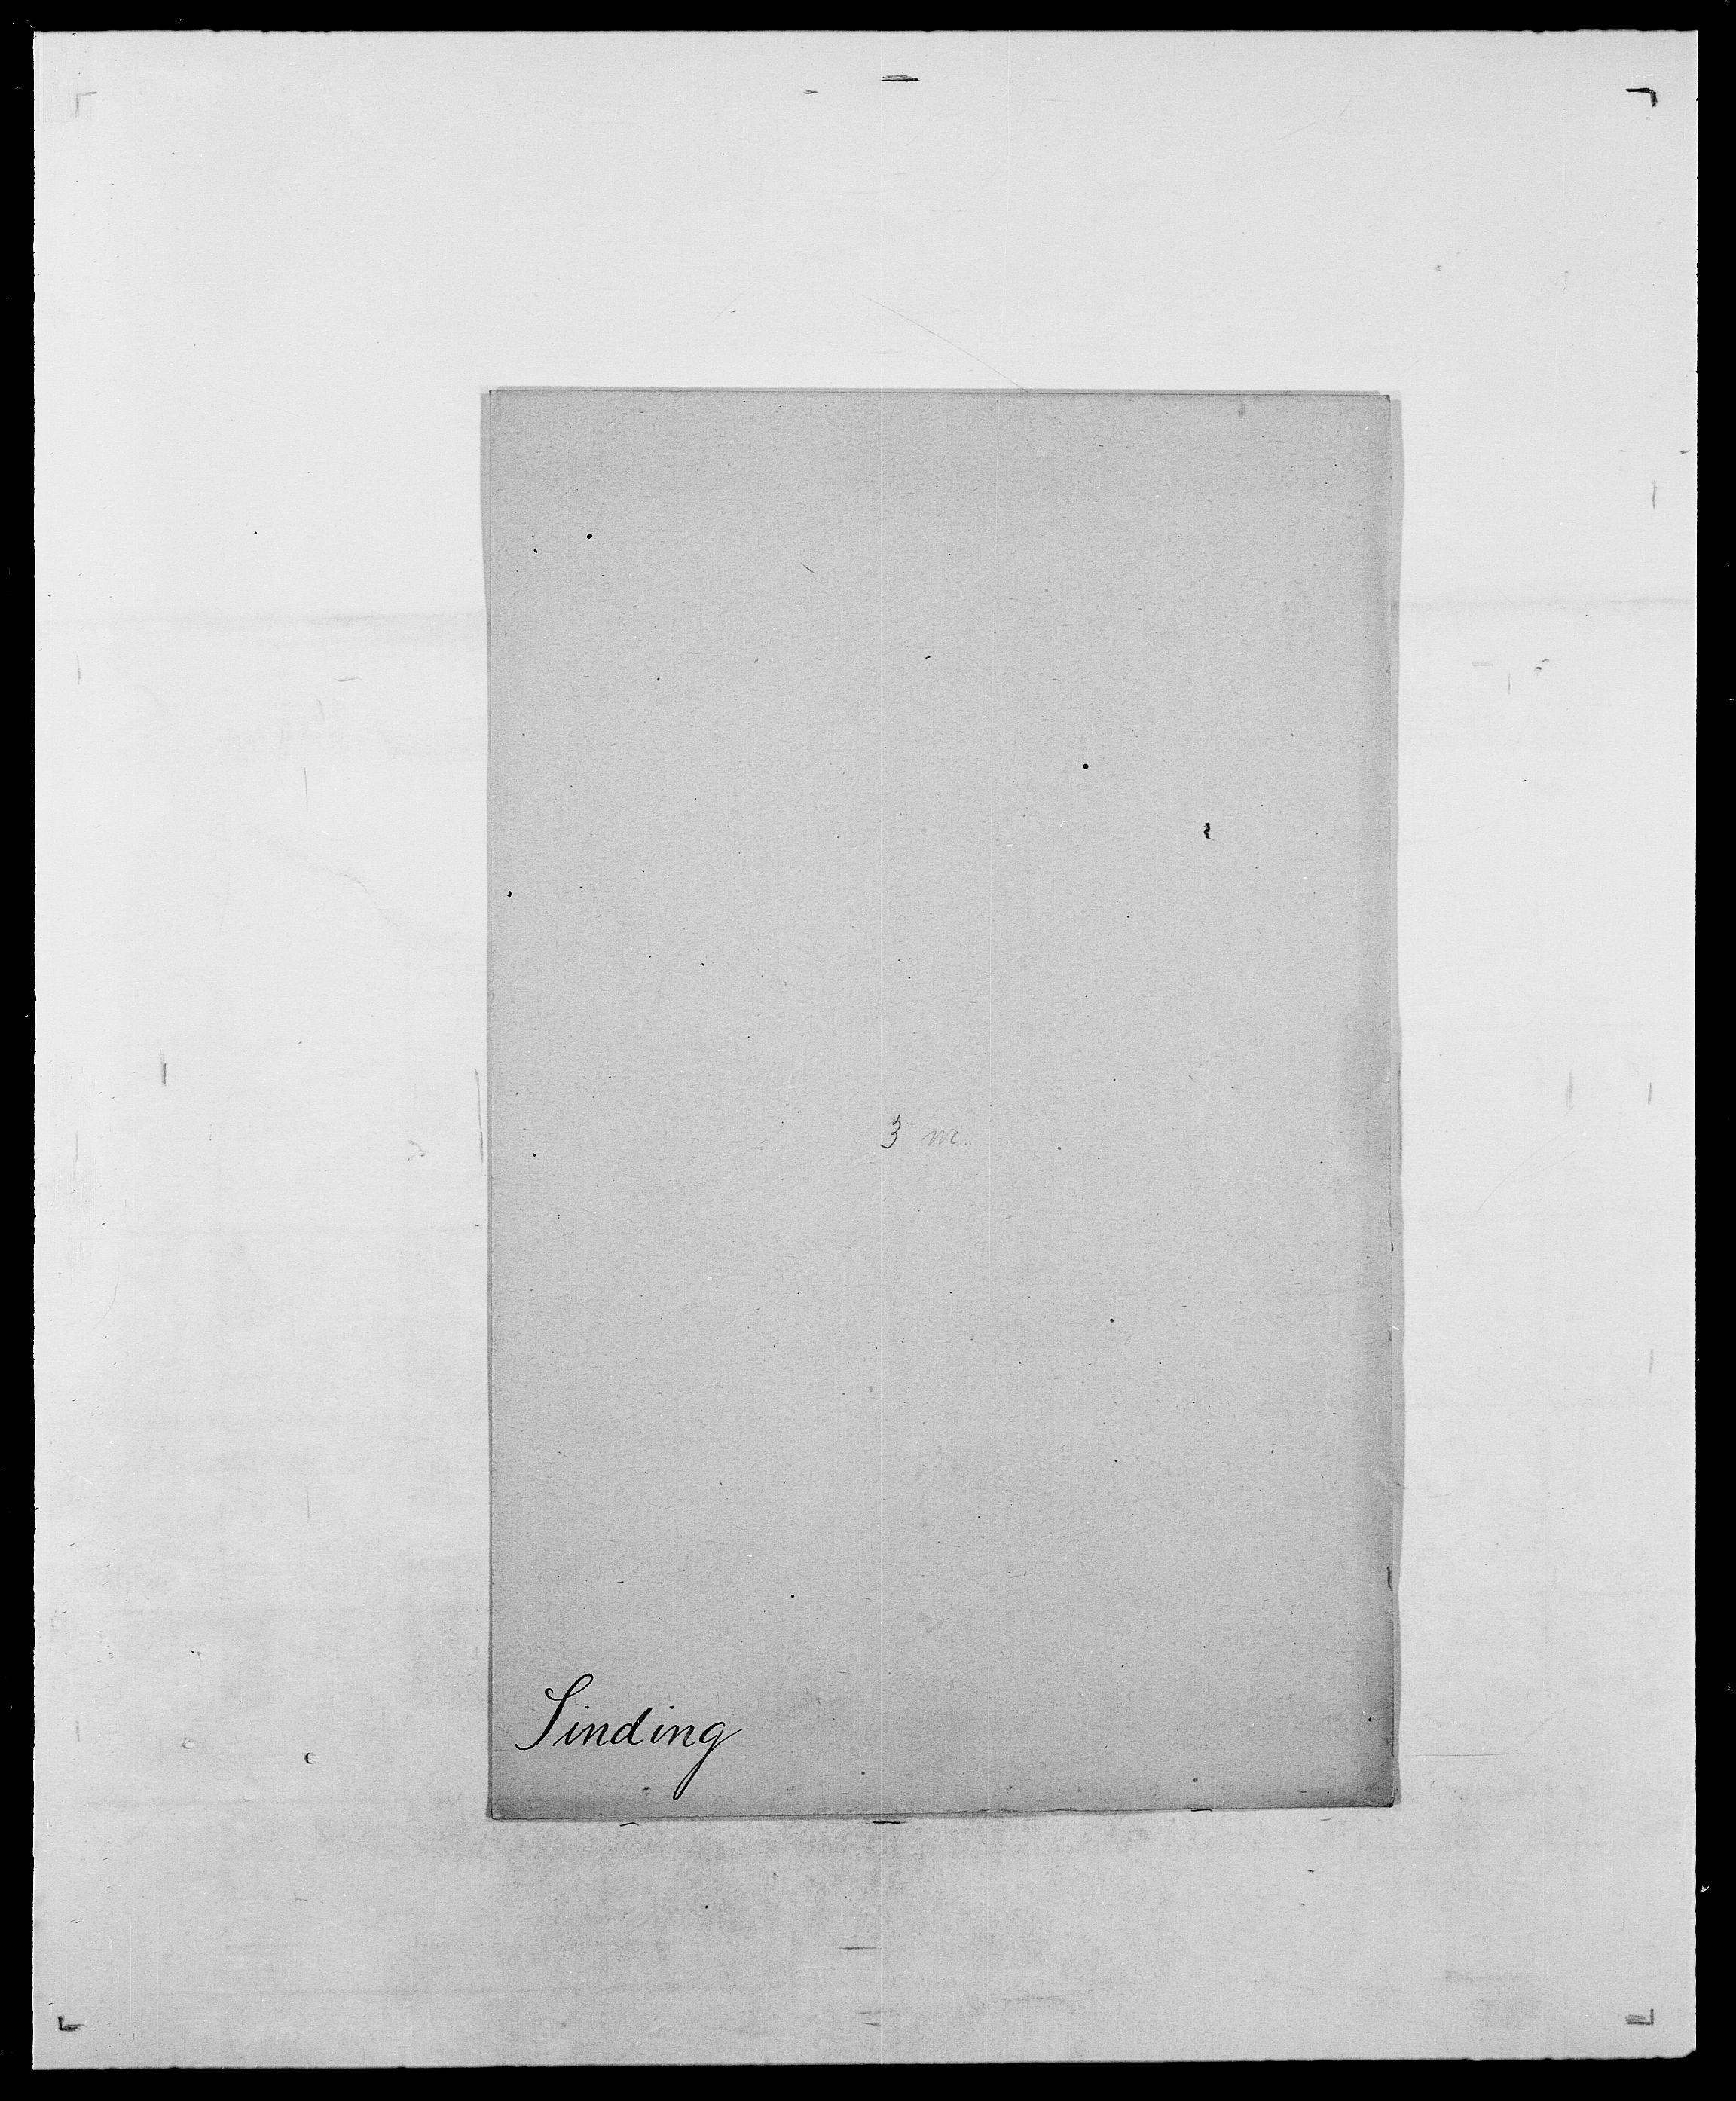 SAO, Delgobe, Charles Antoine - samling, D/Da/L0035: Schnabel - sjetman, s. 919